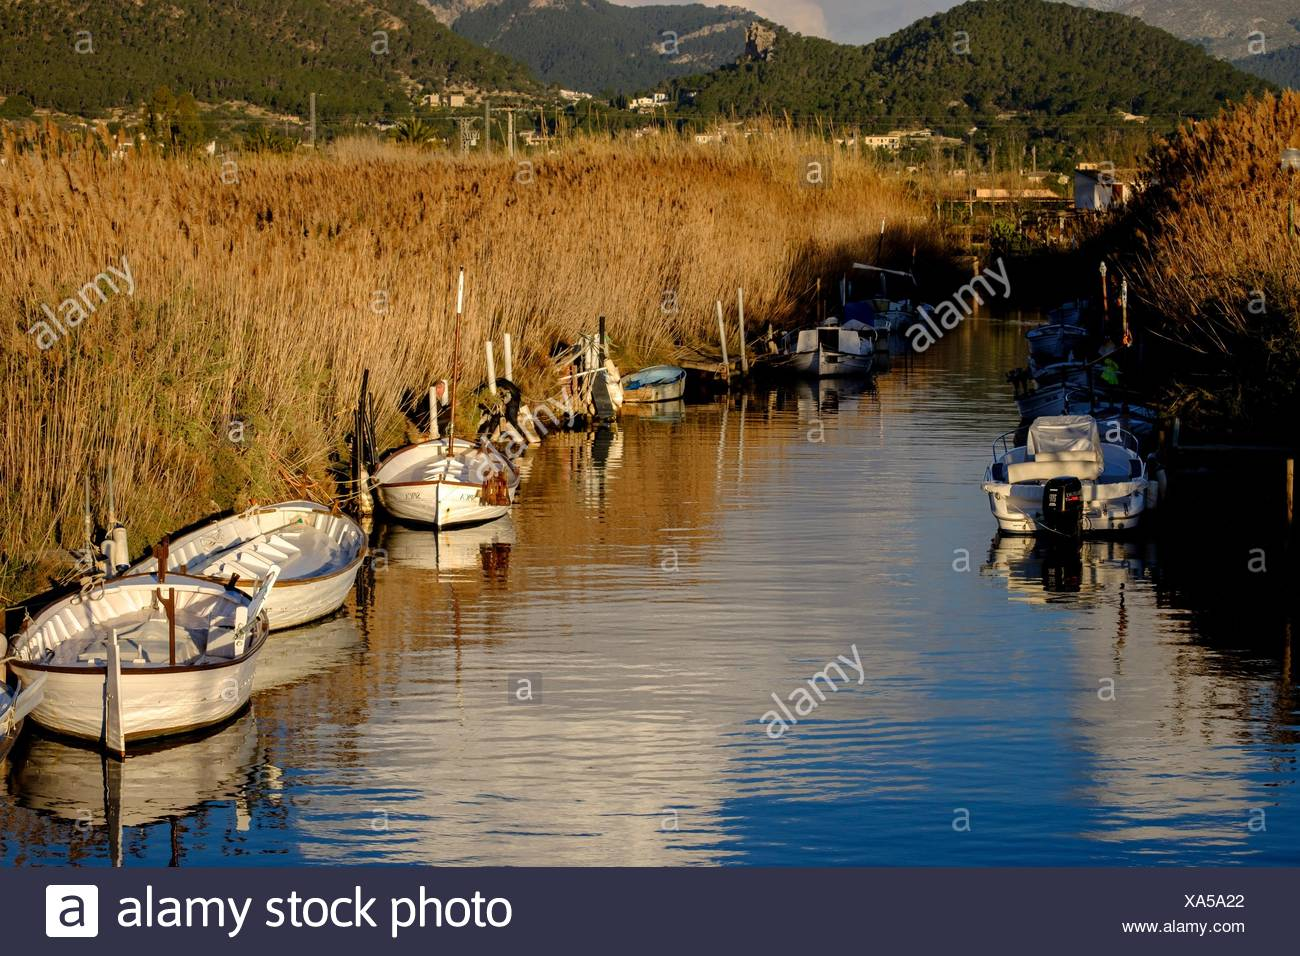 Torrente des Salouet, puerto de Andratx, Mallorca, balearic islands, spain, europe. - Stock Image